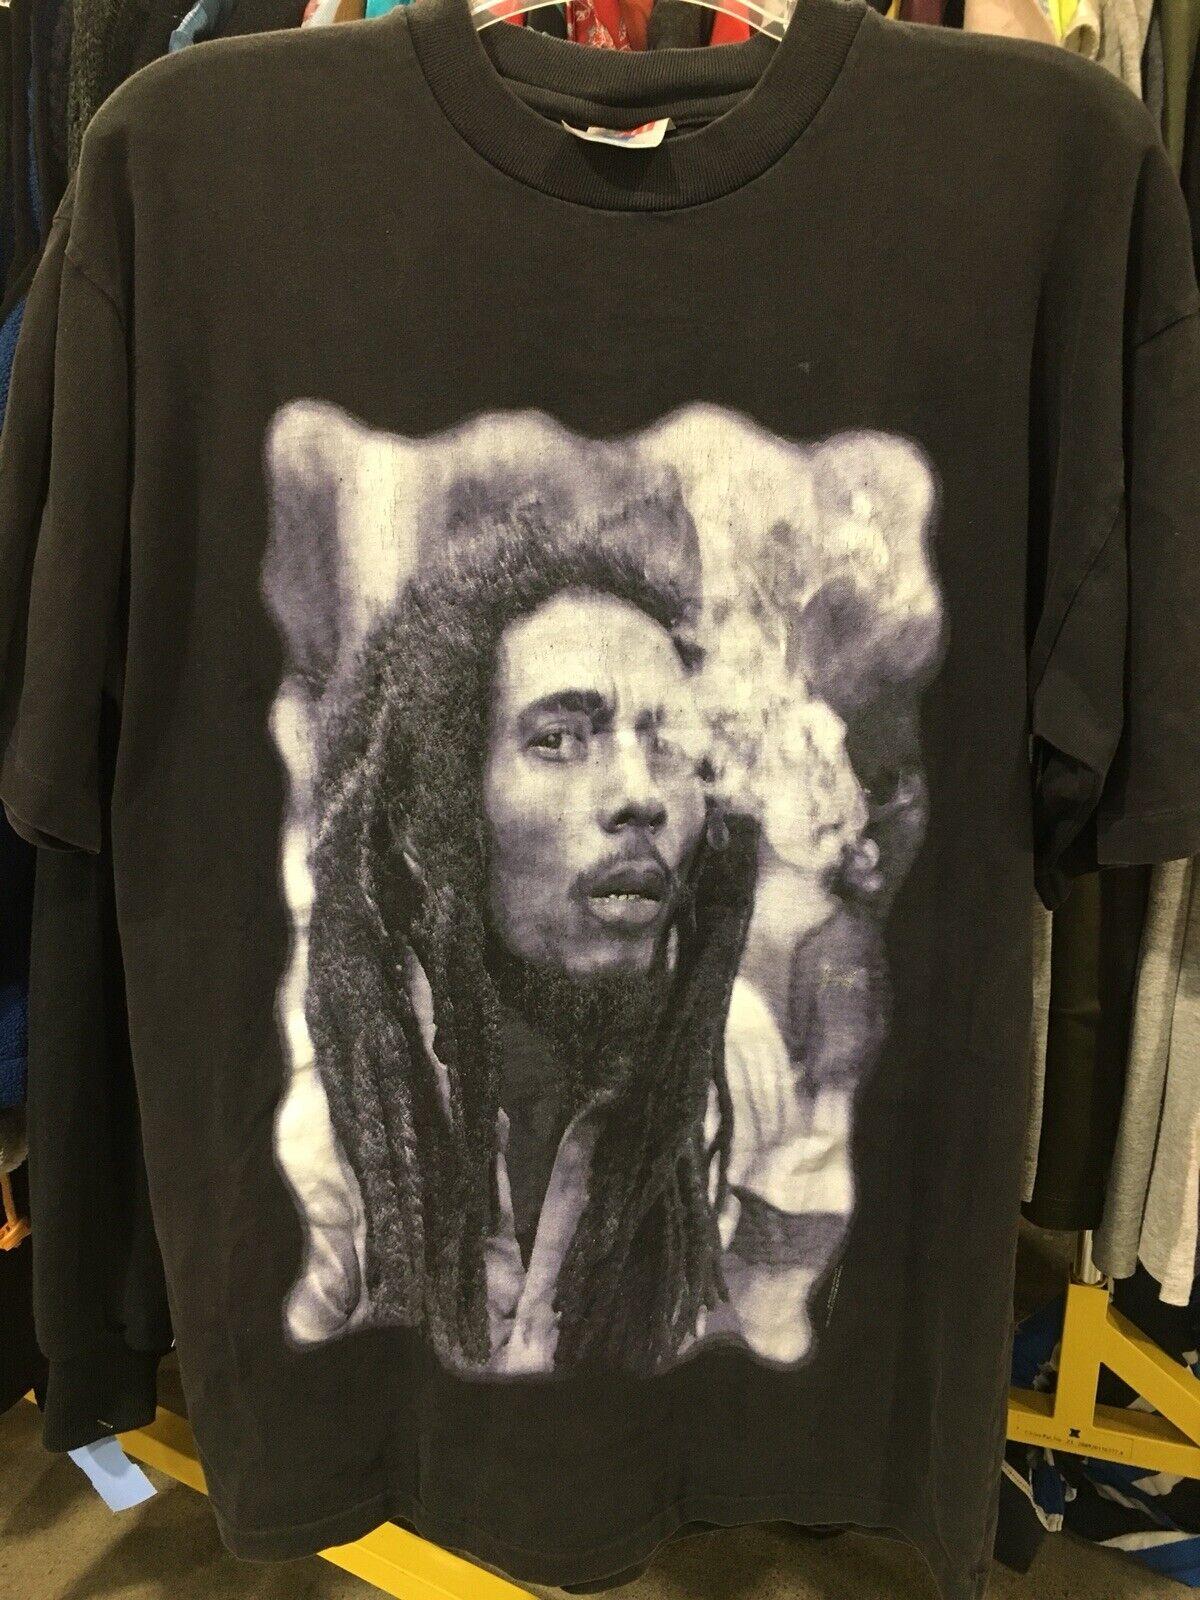 Vintage 1994 Bob Marley Memorial T-Shirt SUN ISLAND Vtg 90s Rare Rasta Smoke